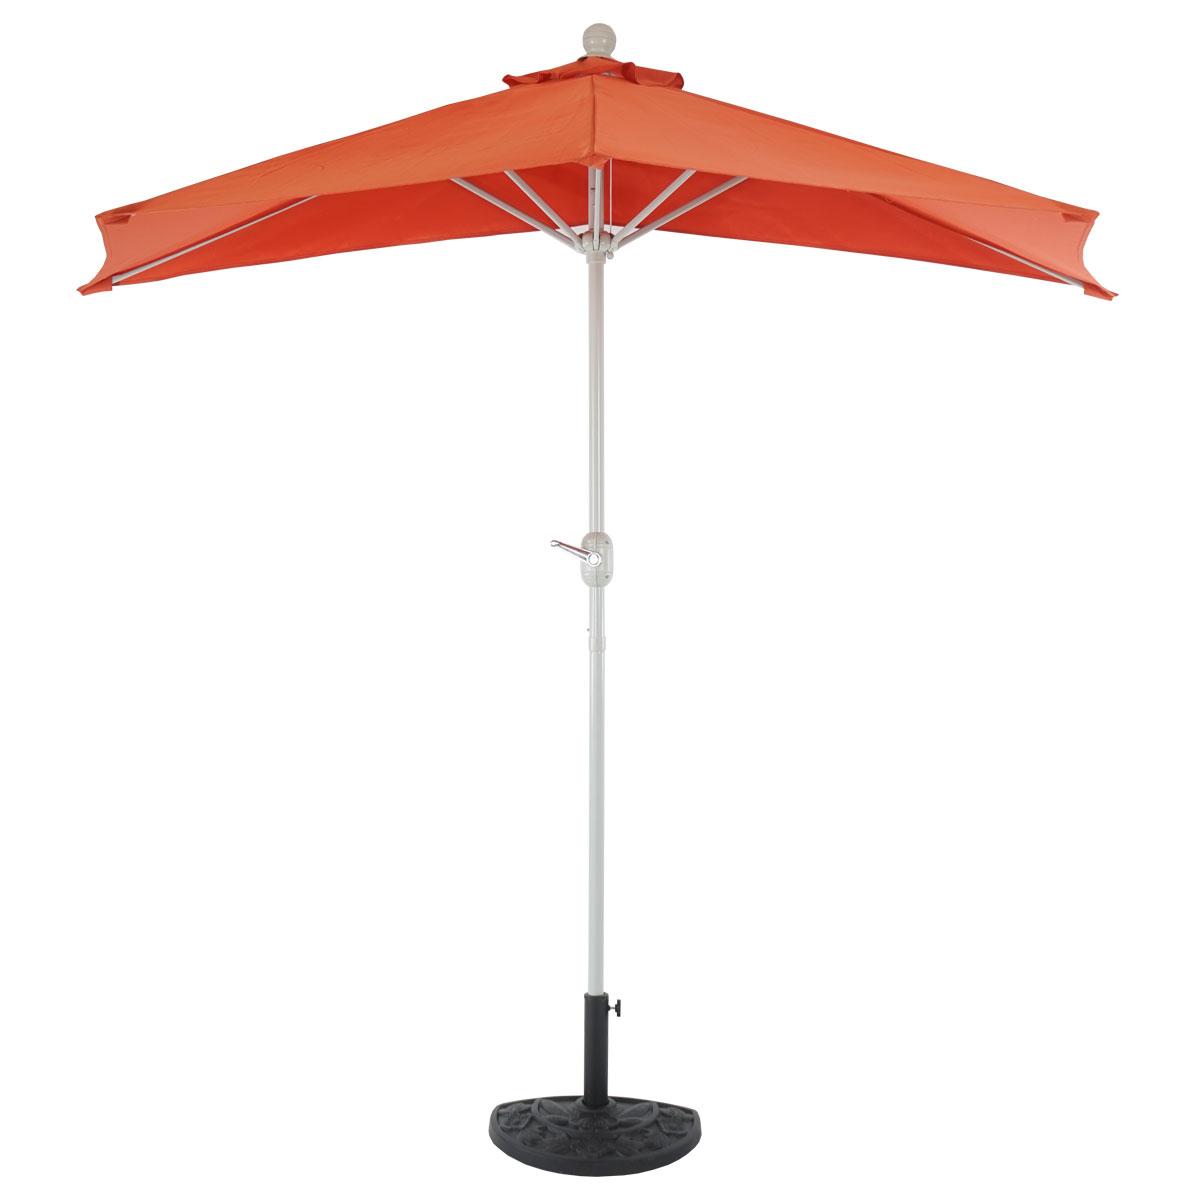 demi parasol aluminium parla pour balcon ip 50 260cm terracotta avec pied ebay. Black Bedroom Furniture Sets. Home Design Ideas